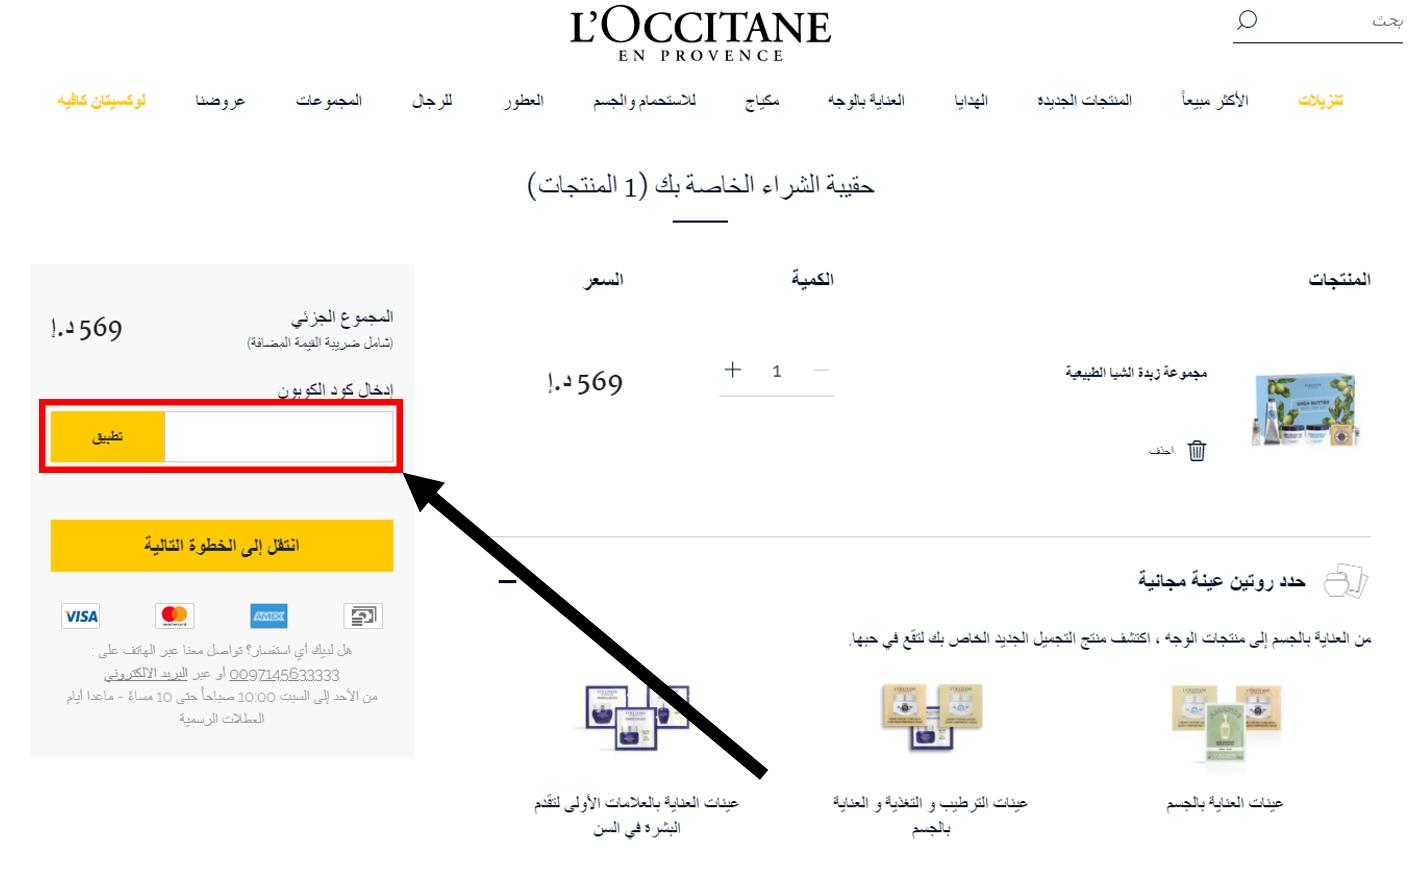 كيف أستخدم كود خصم لوكسيتان Loccitane Coupon Code كوبون خصم لوكسيتان